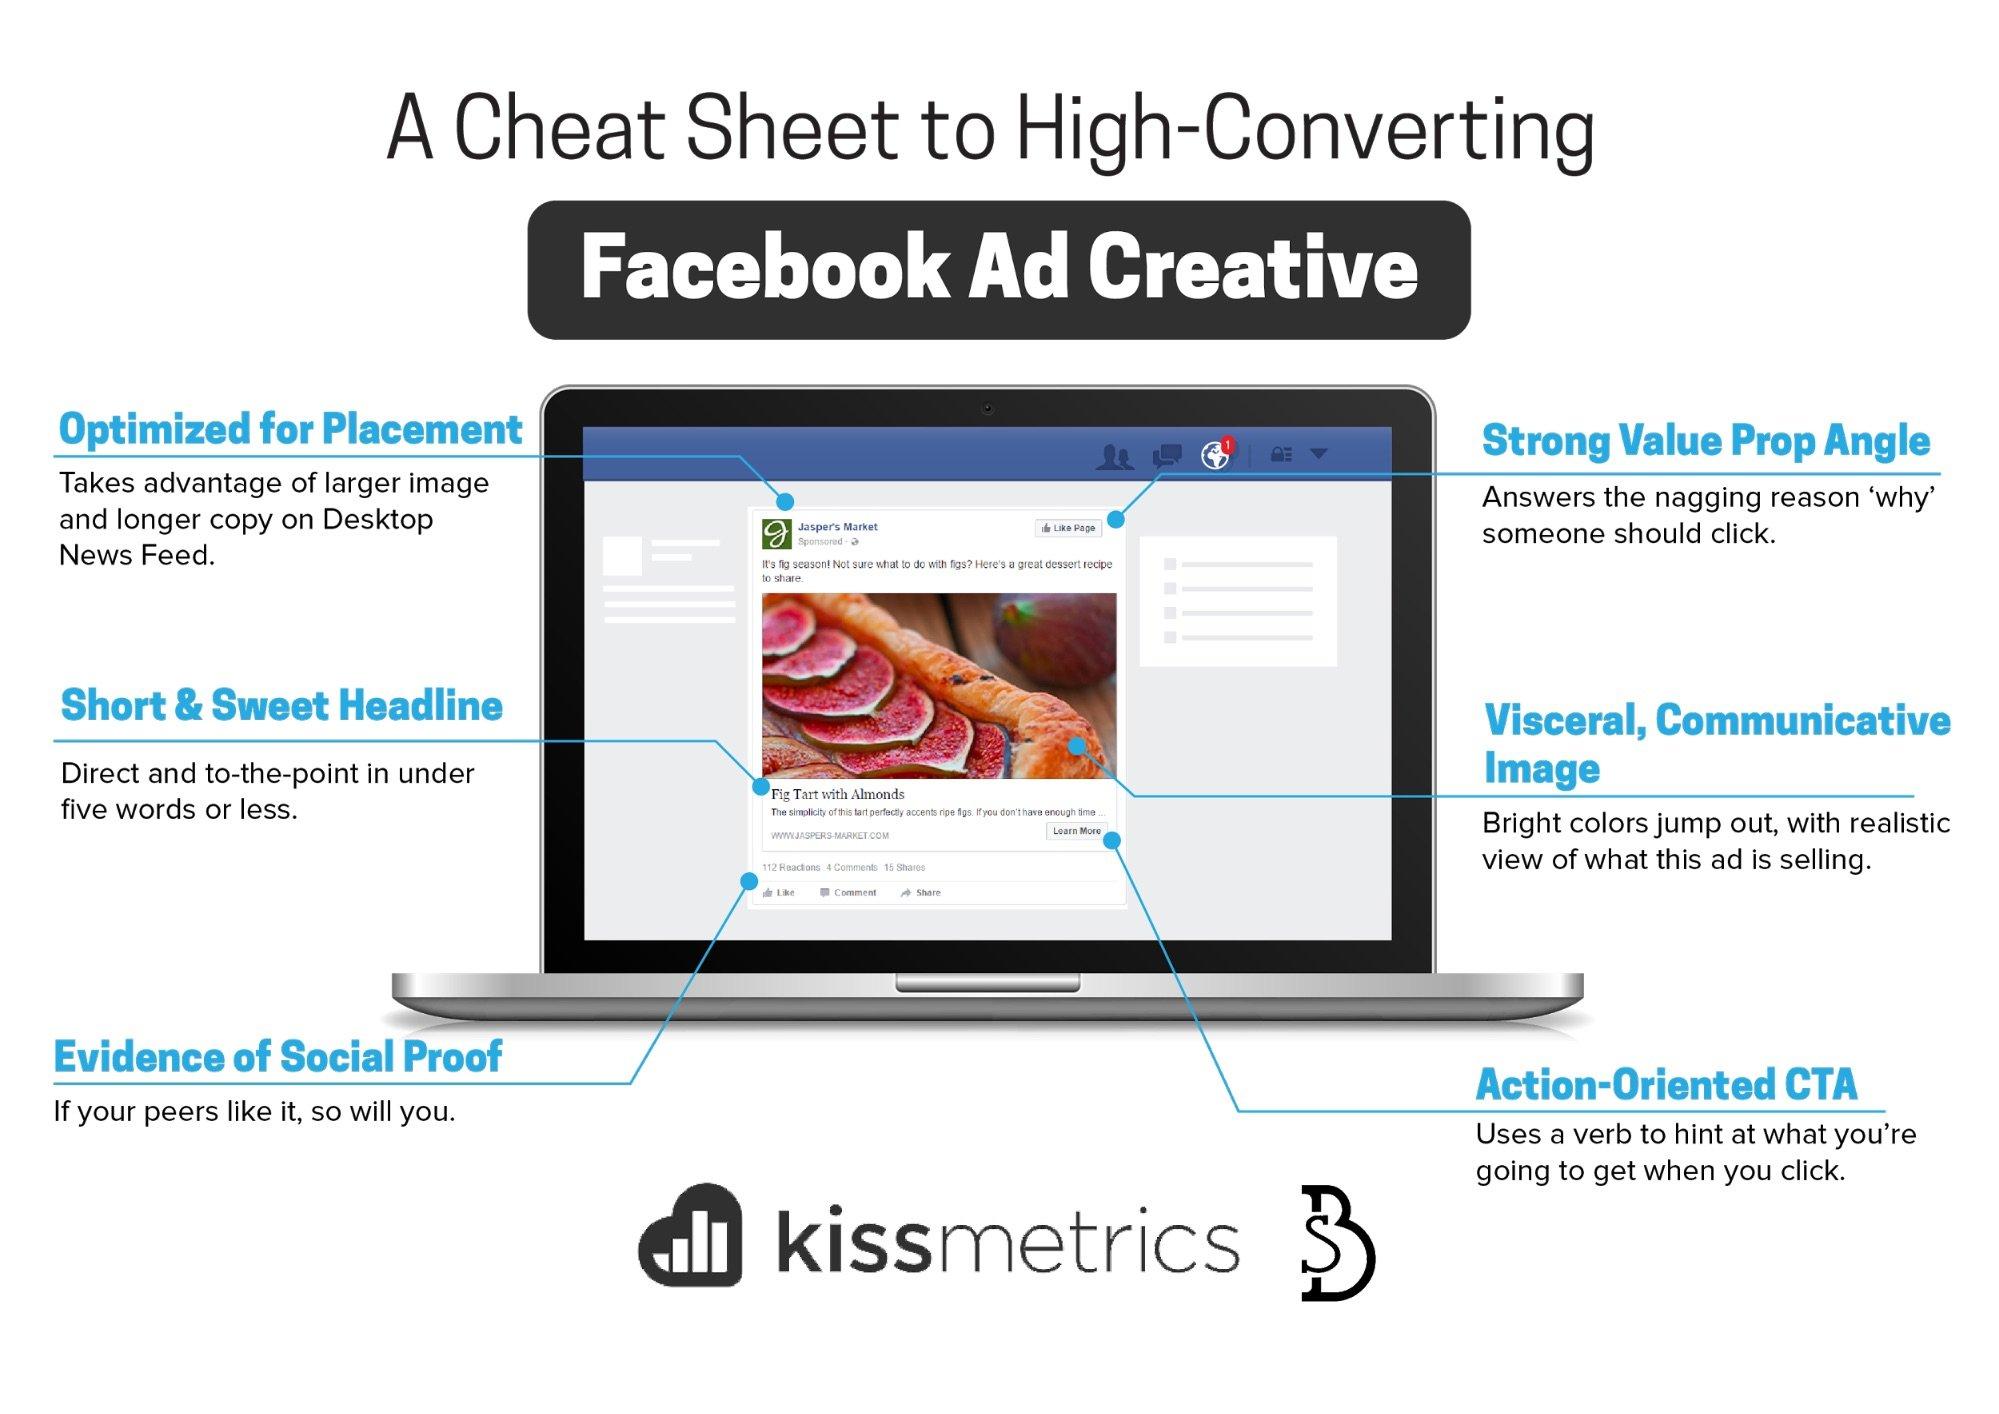 cheat-sheet-facebook-ad-creative